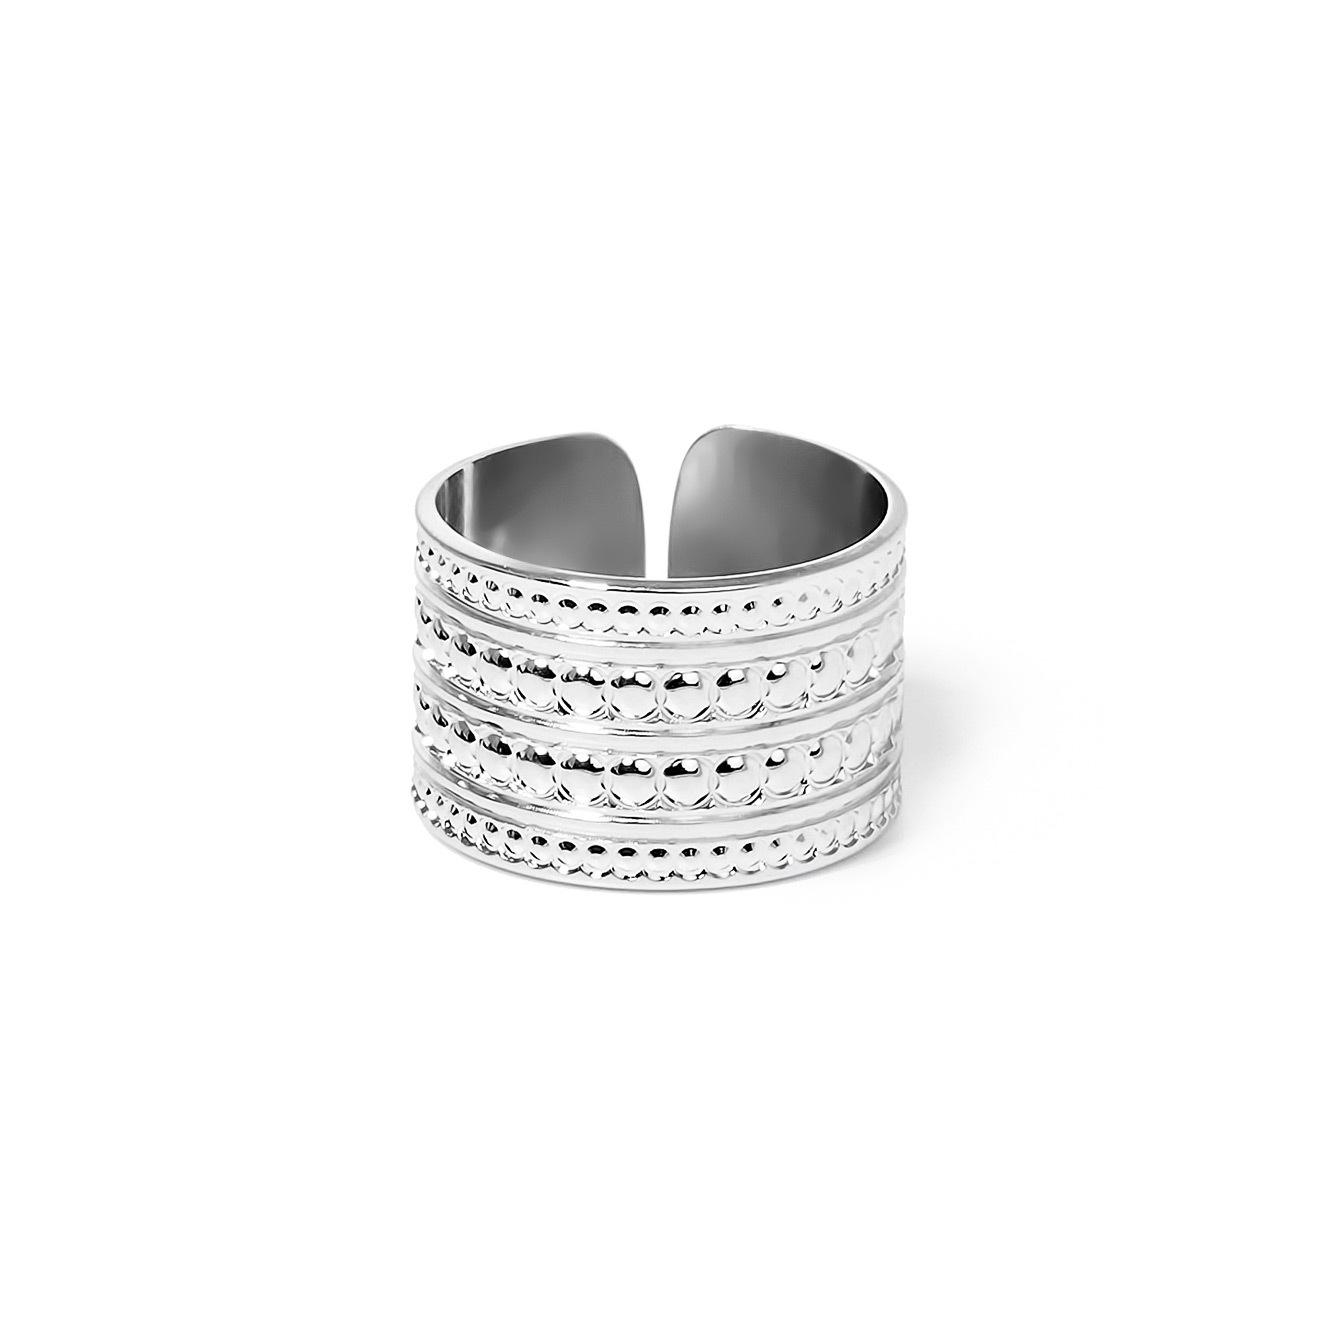 Mya Bay Покрытое серебром кольцо Maharaja